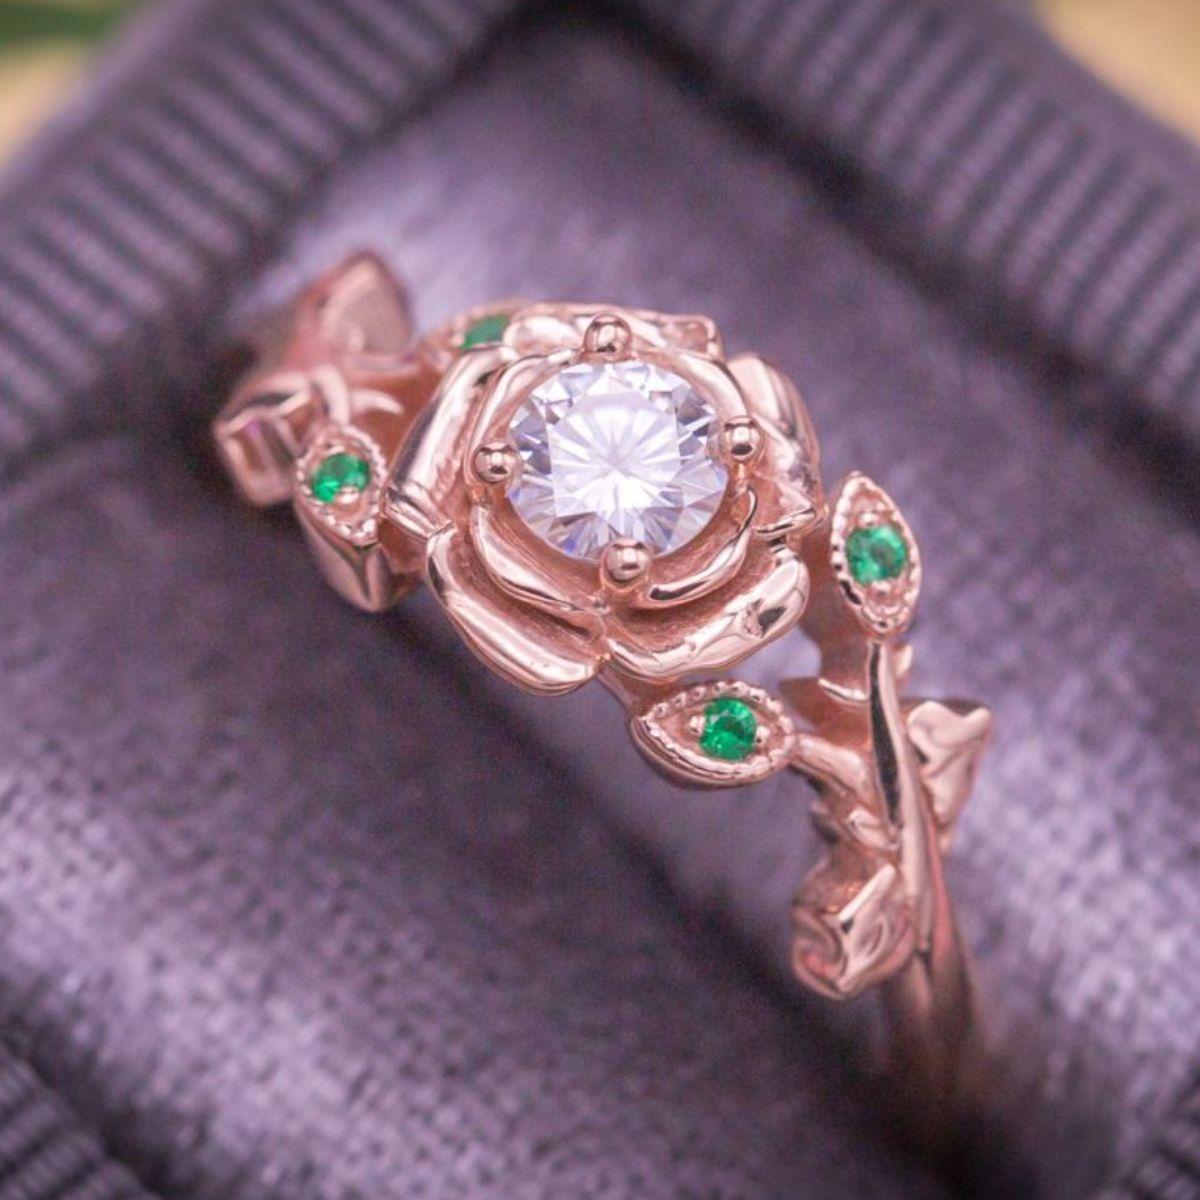 766d10a0cedb1 Flower Engagement Rings | CustomMade.com